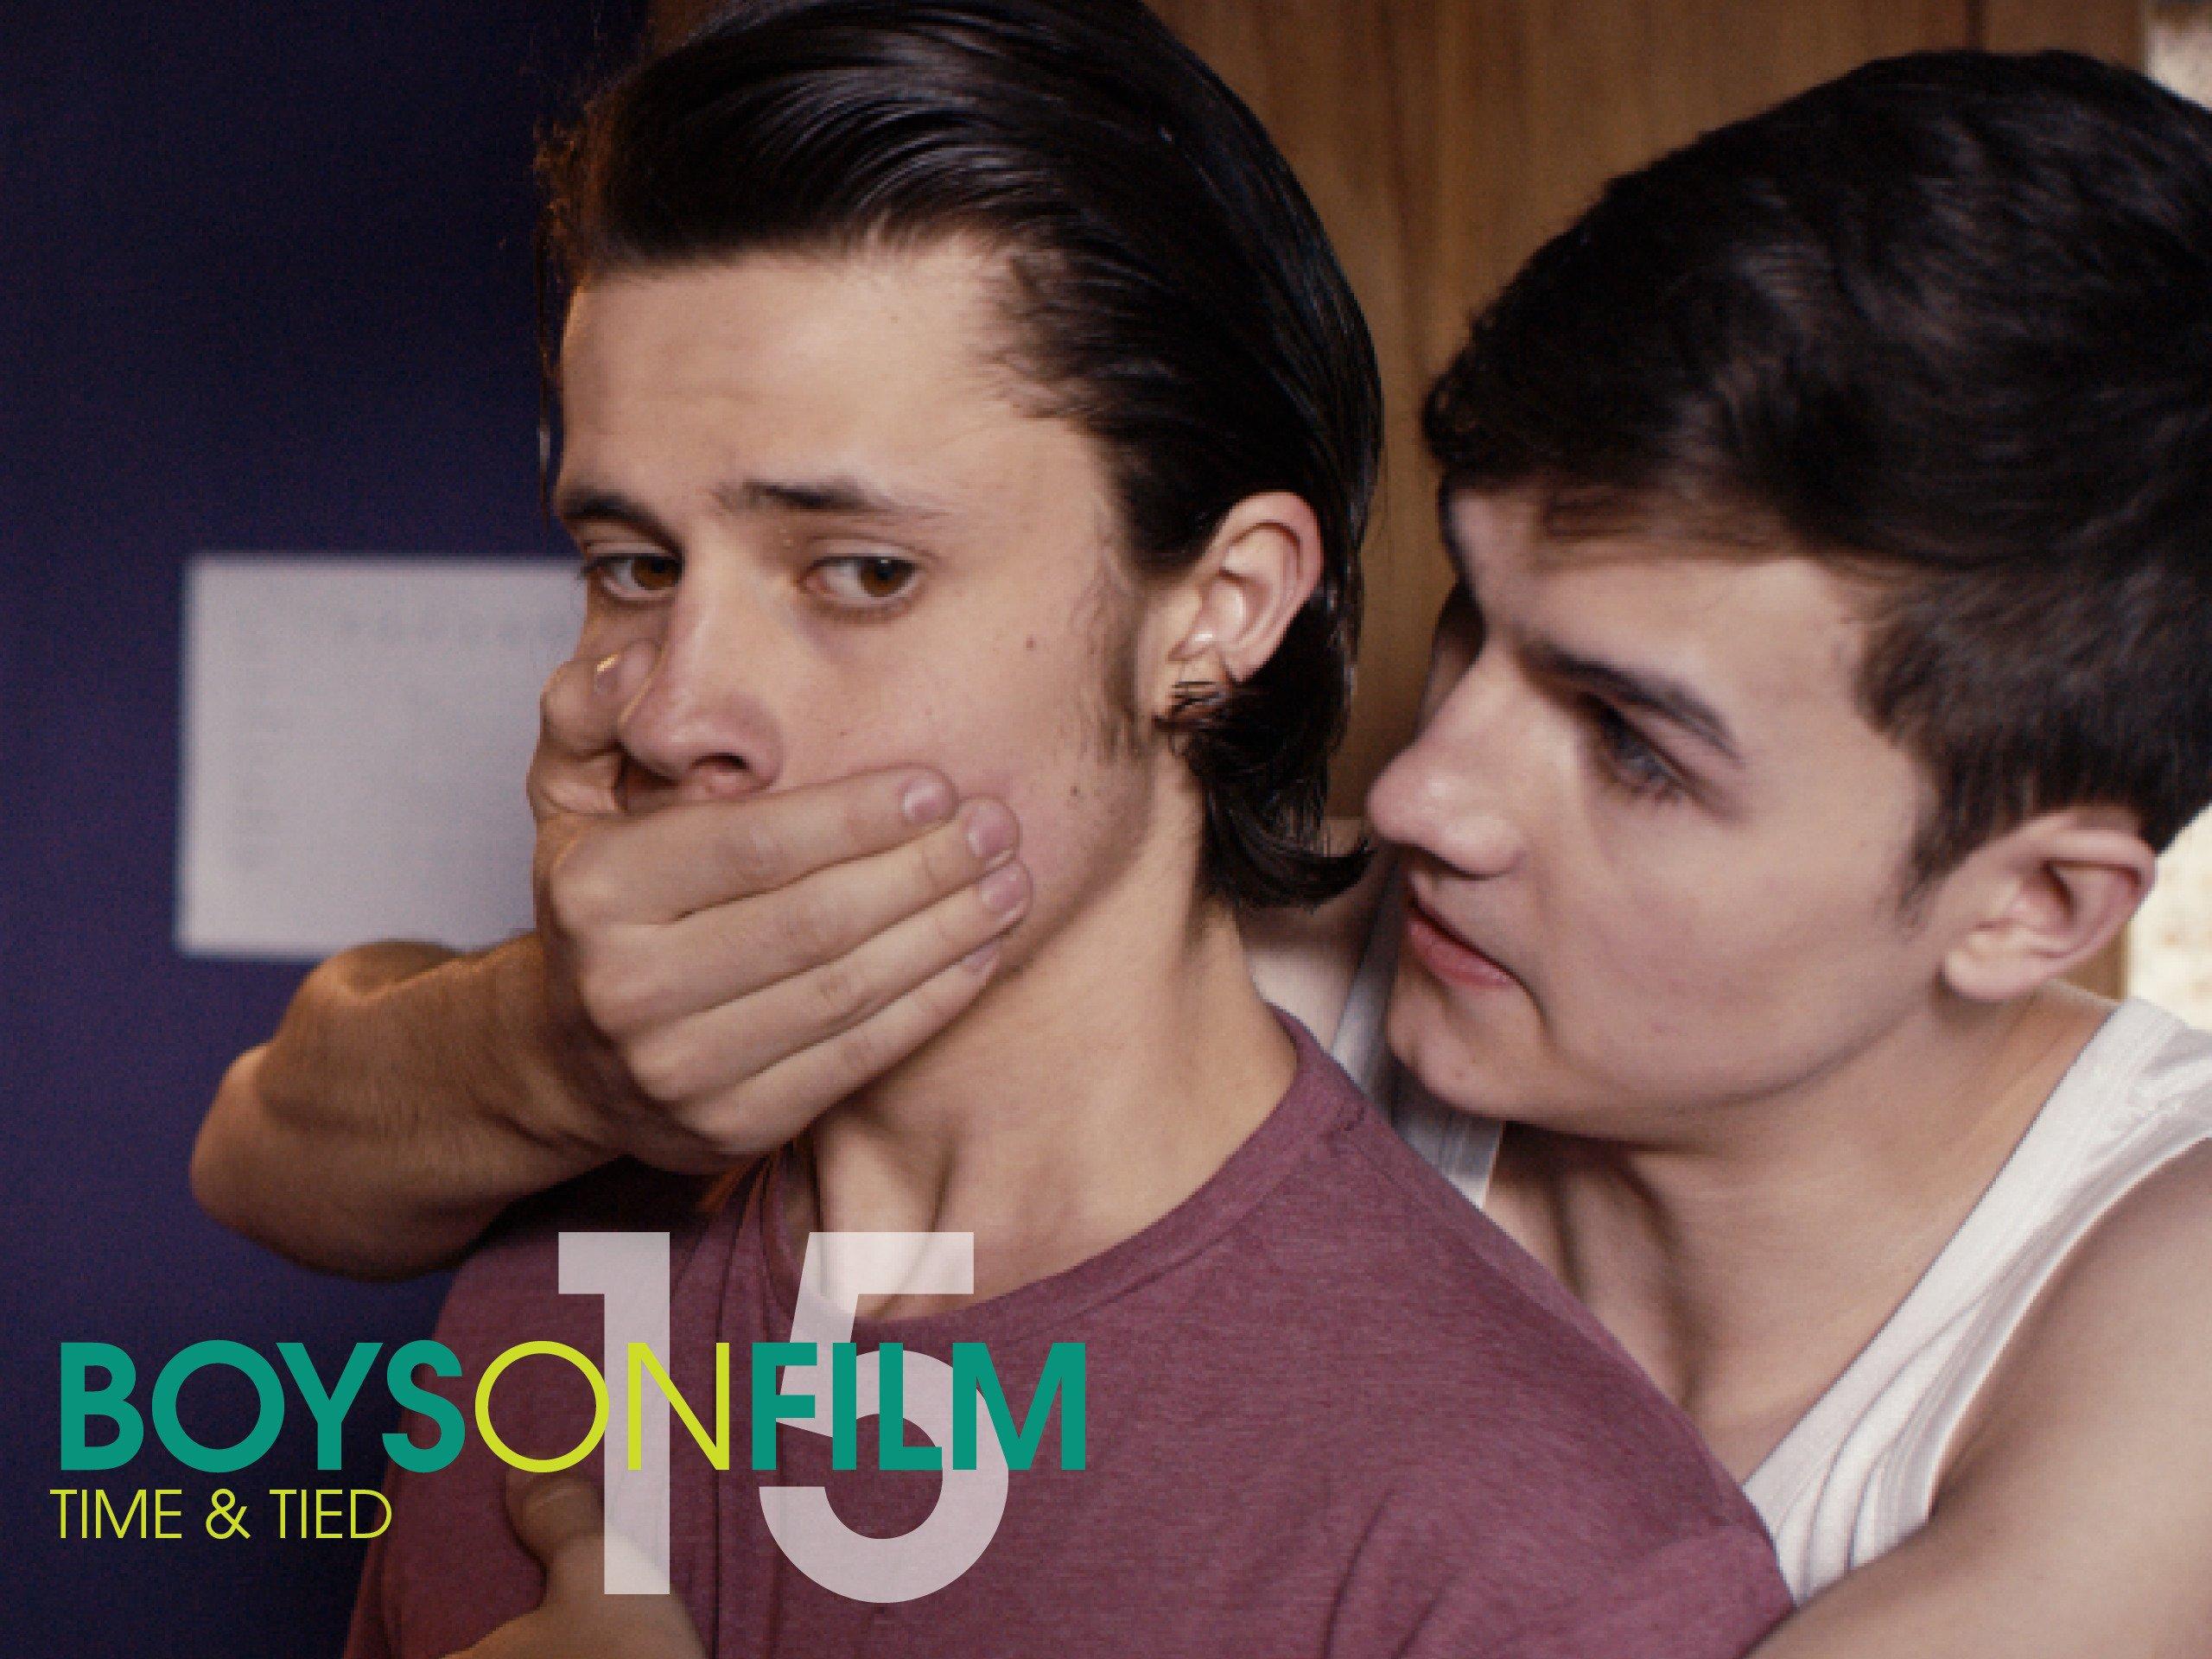 Young boy gay sex blog video